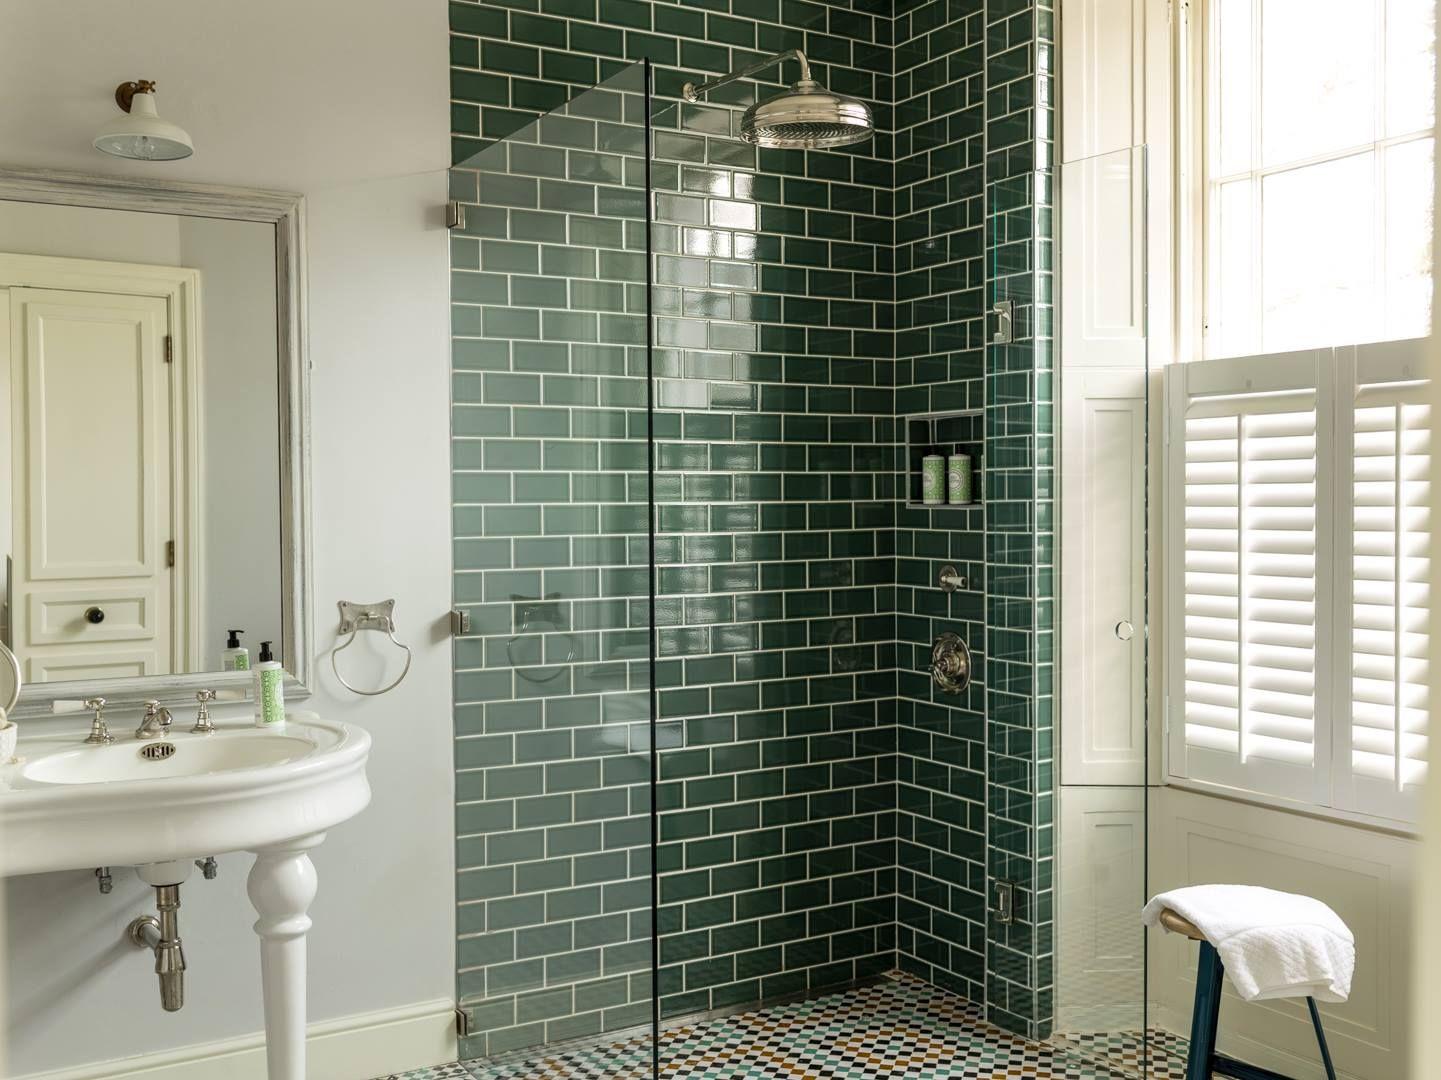 Crackle Glaze Wall Tiles Uk Wall Tiles Wall Tiles Dark Green Bathrooms Green Bathroom Green Tile Bathroom